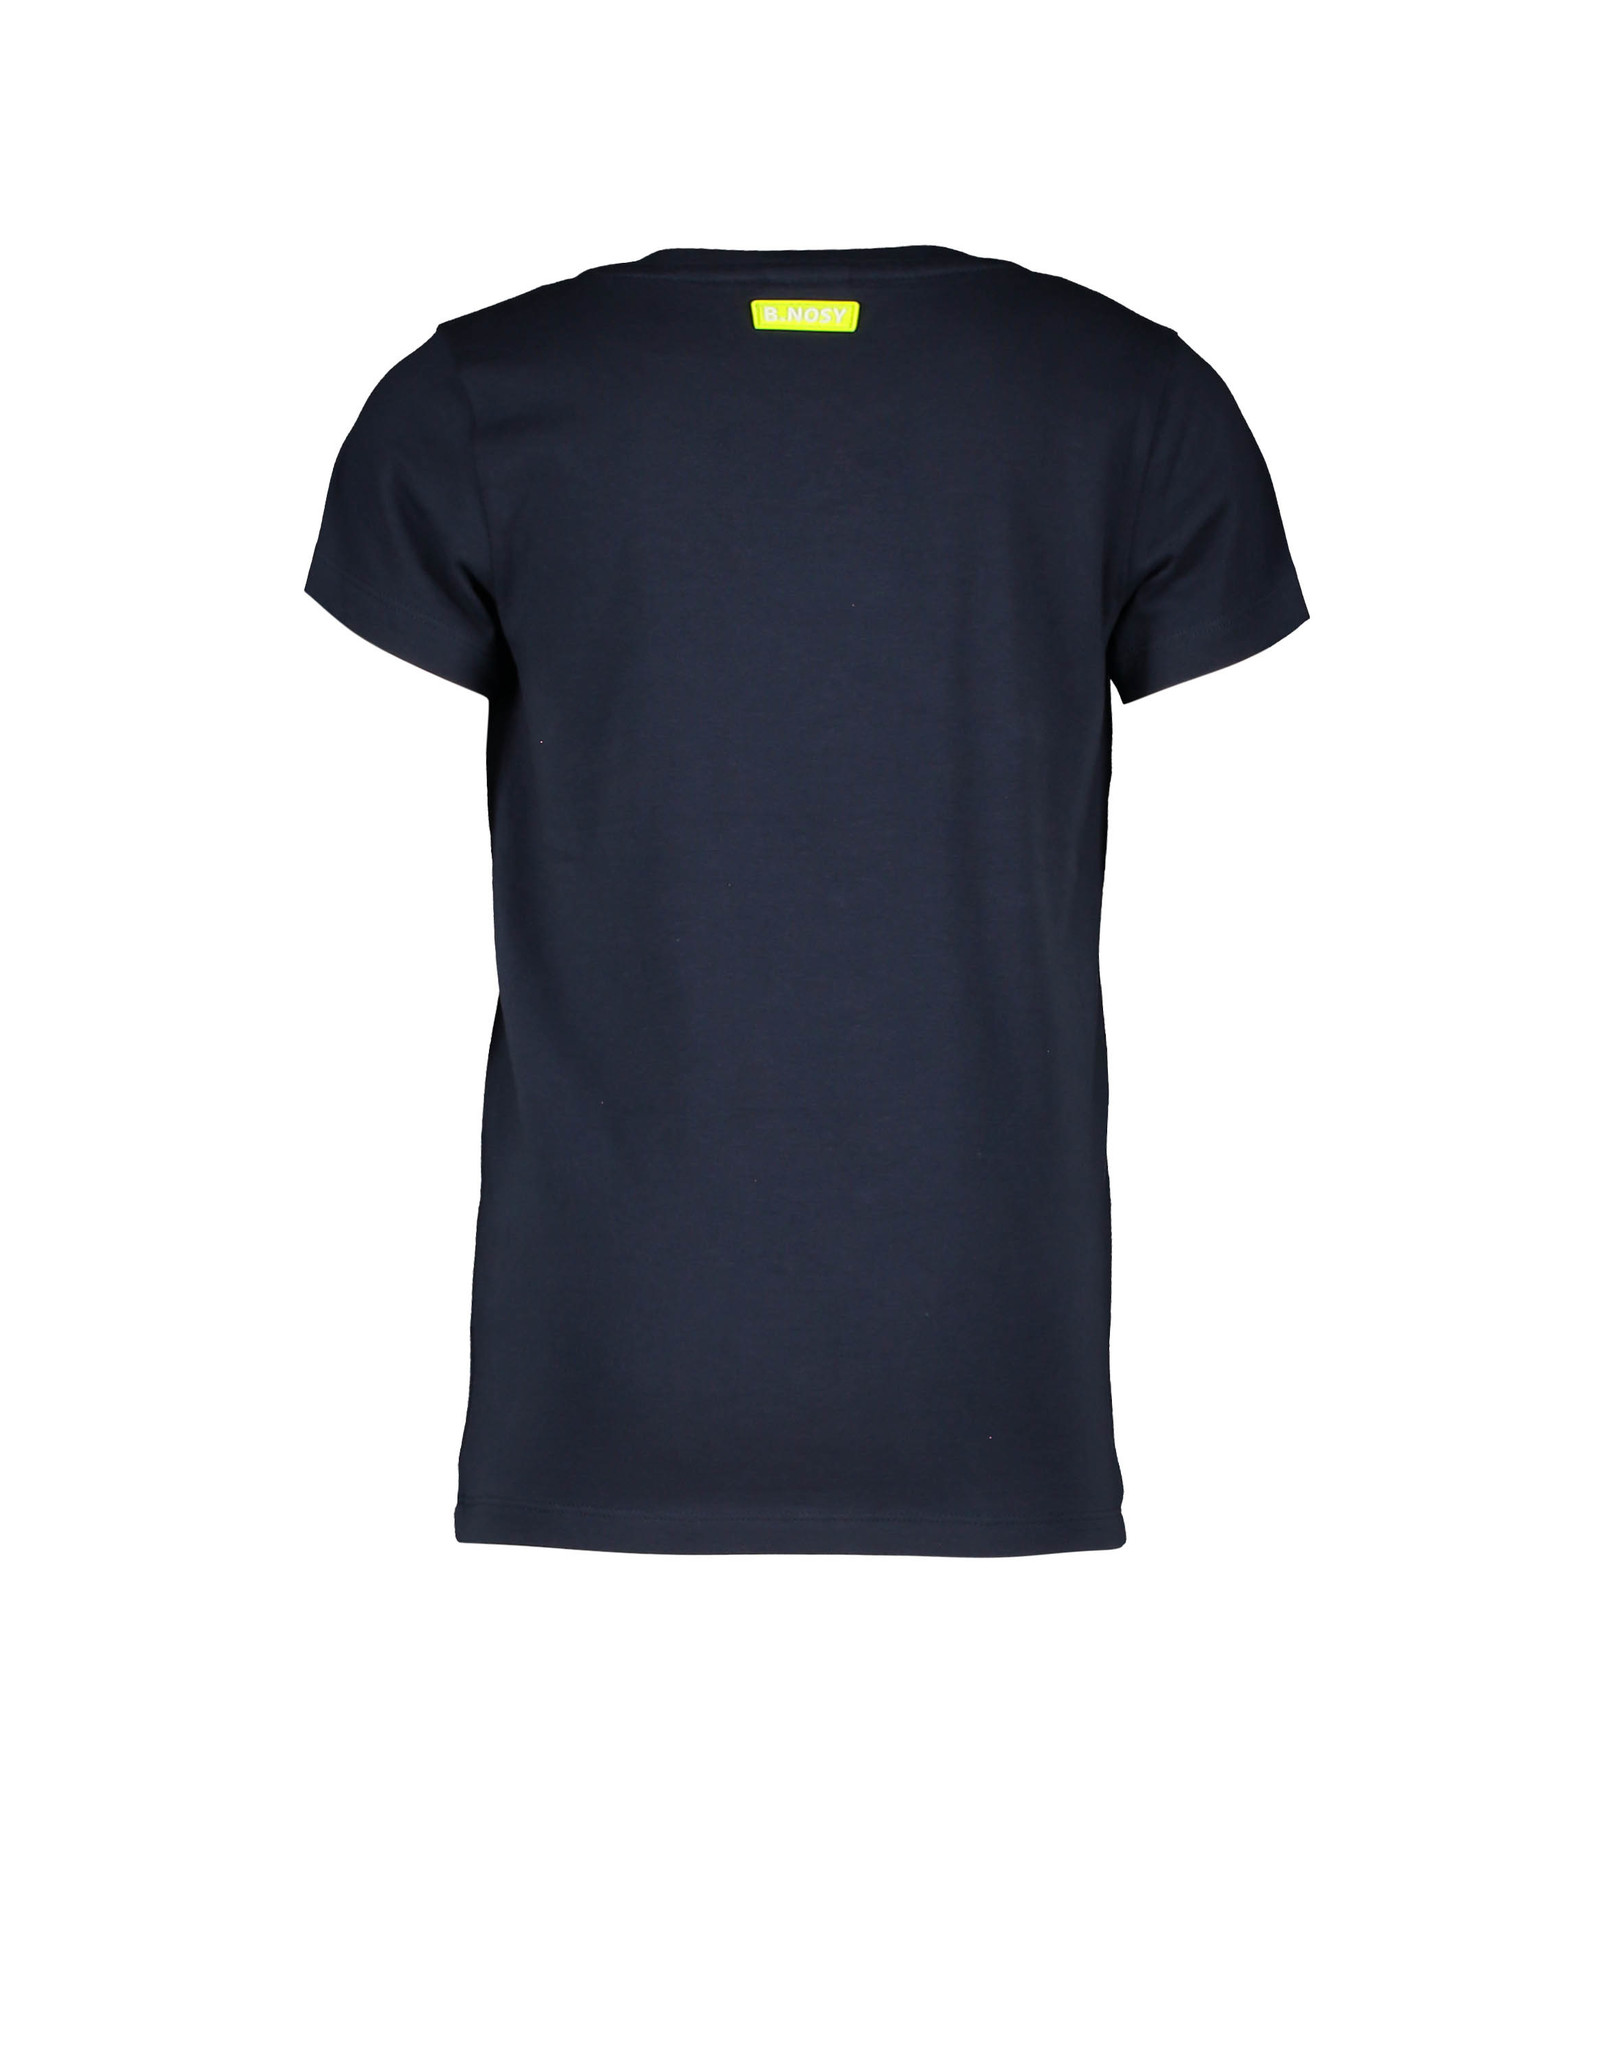 B-Nosy Boys v-neck t-shirt with chest artwork, Oxford blue